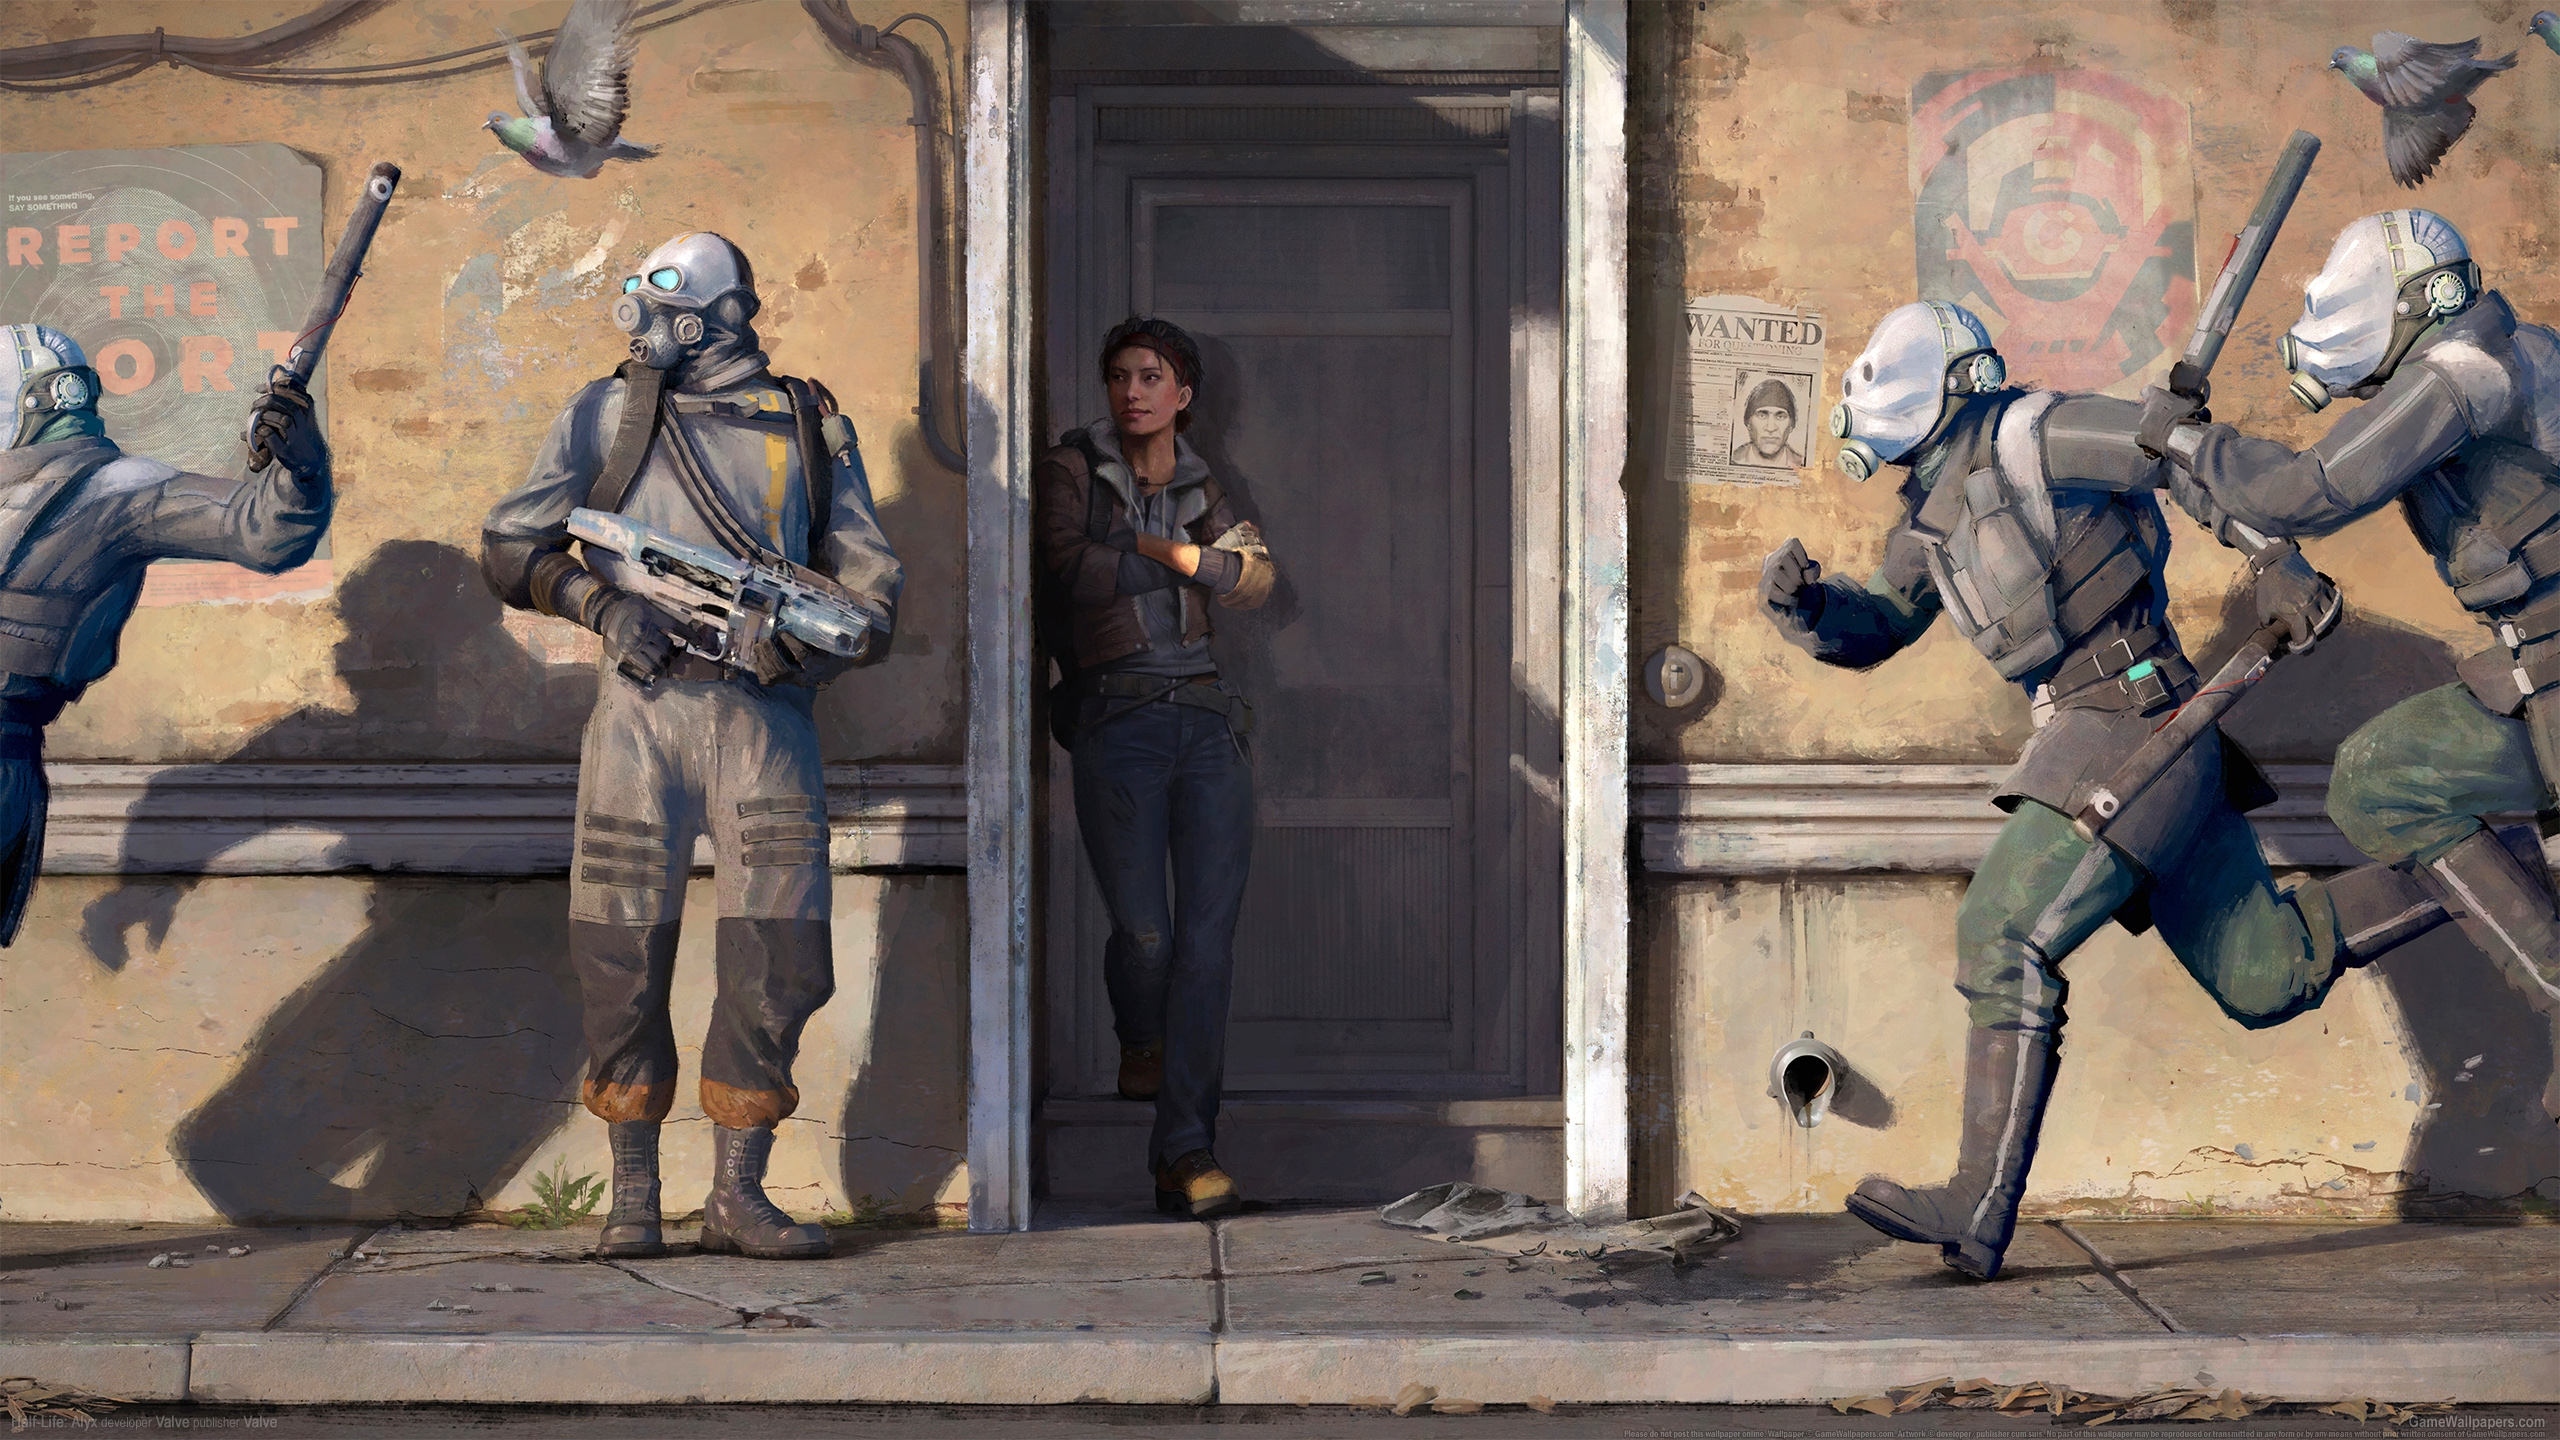 Half-Life: Alyx 2560x1440 wallpaper or background 01